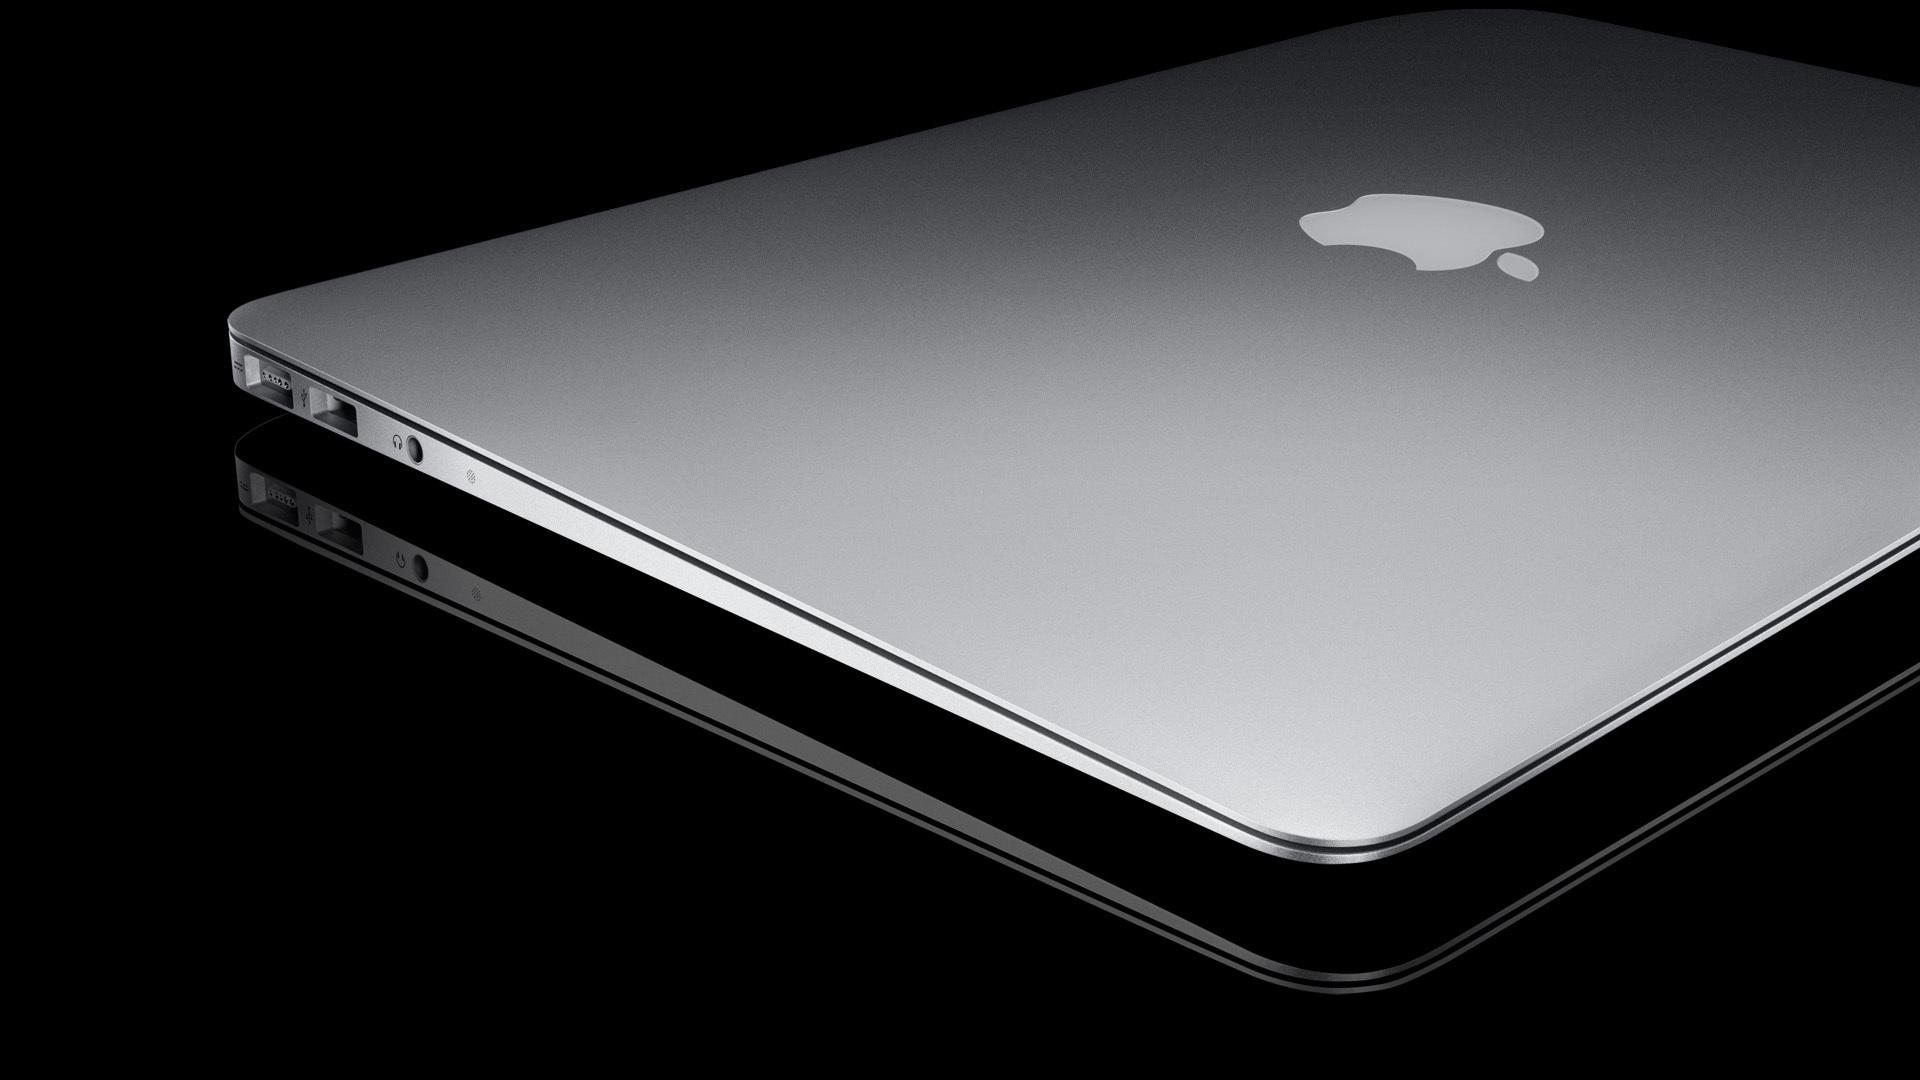 apple laptop wallpapers55com   Best Wallpapers for PCs Laptops 1920x1080